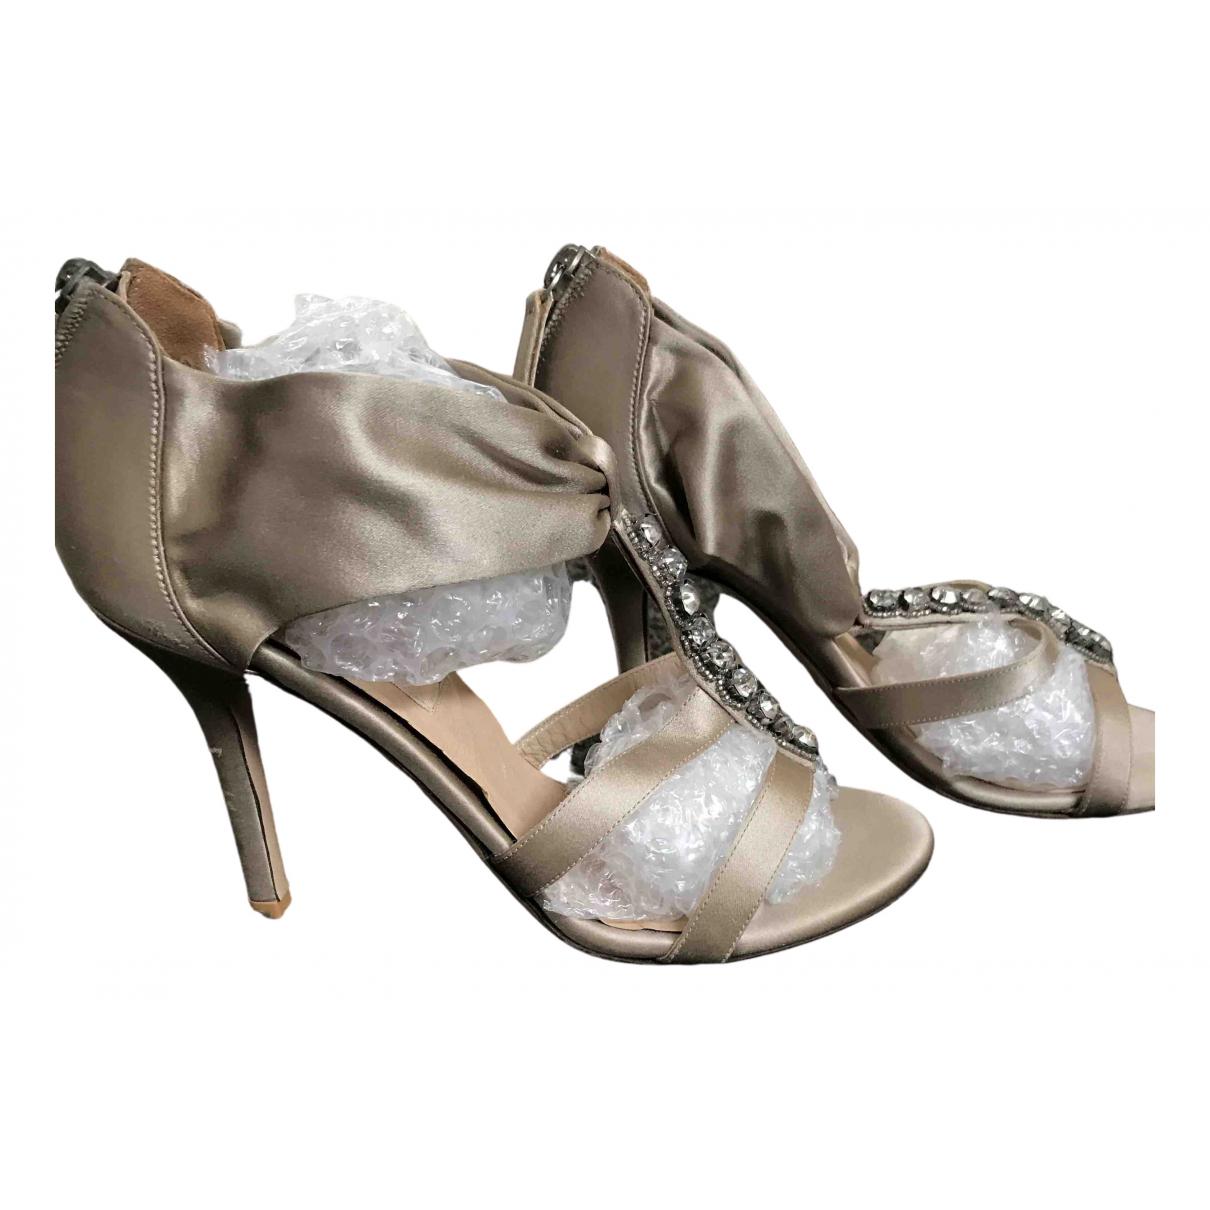 Valentino Garavani \N Beige Cloth Sandals for Women 36 EU